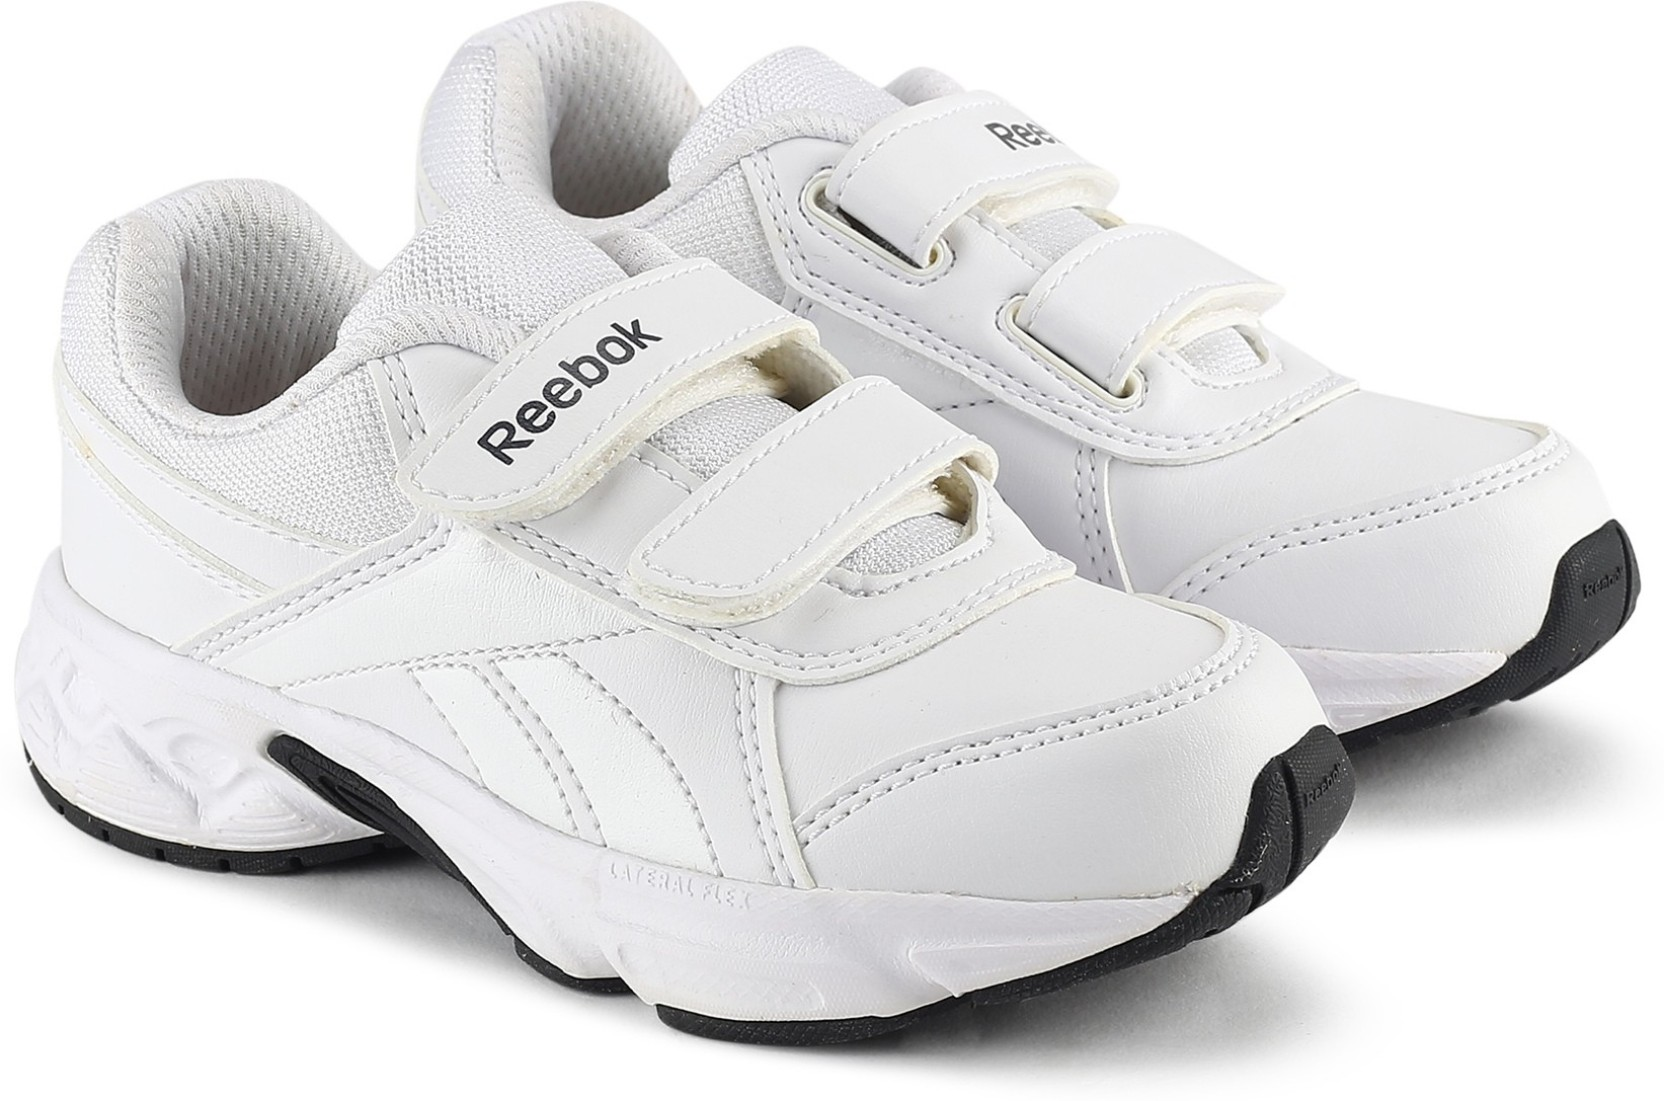 a90e956b1aa REEBOK Boys Velcro Running Shoes Price in India - Buy REEBOK Boys ...